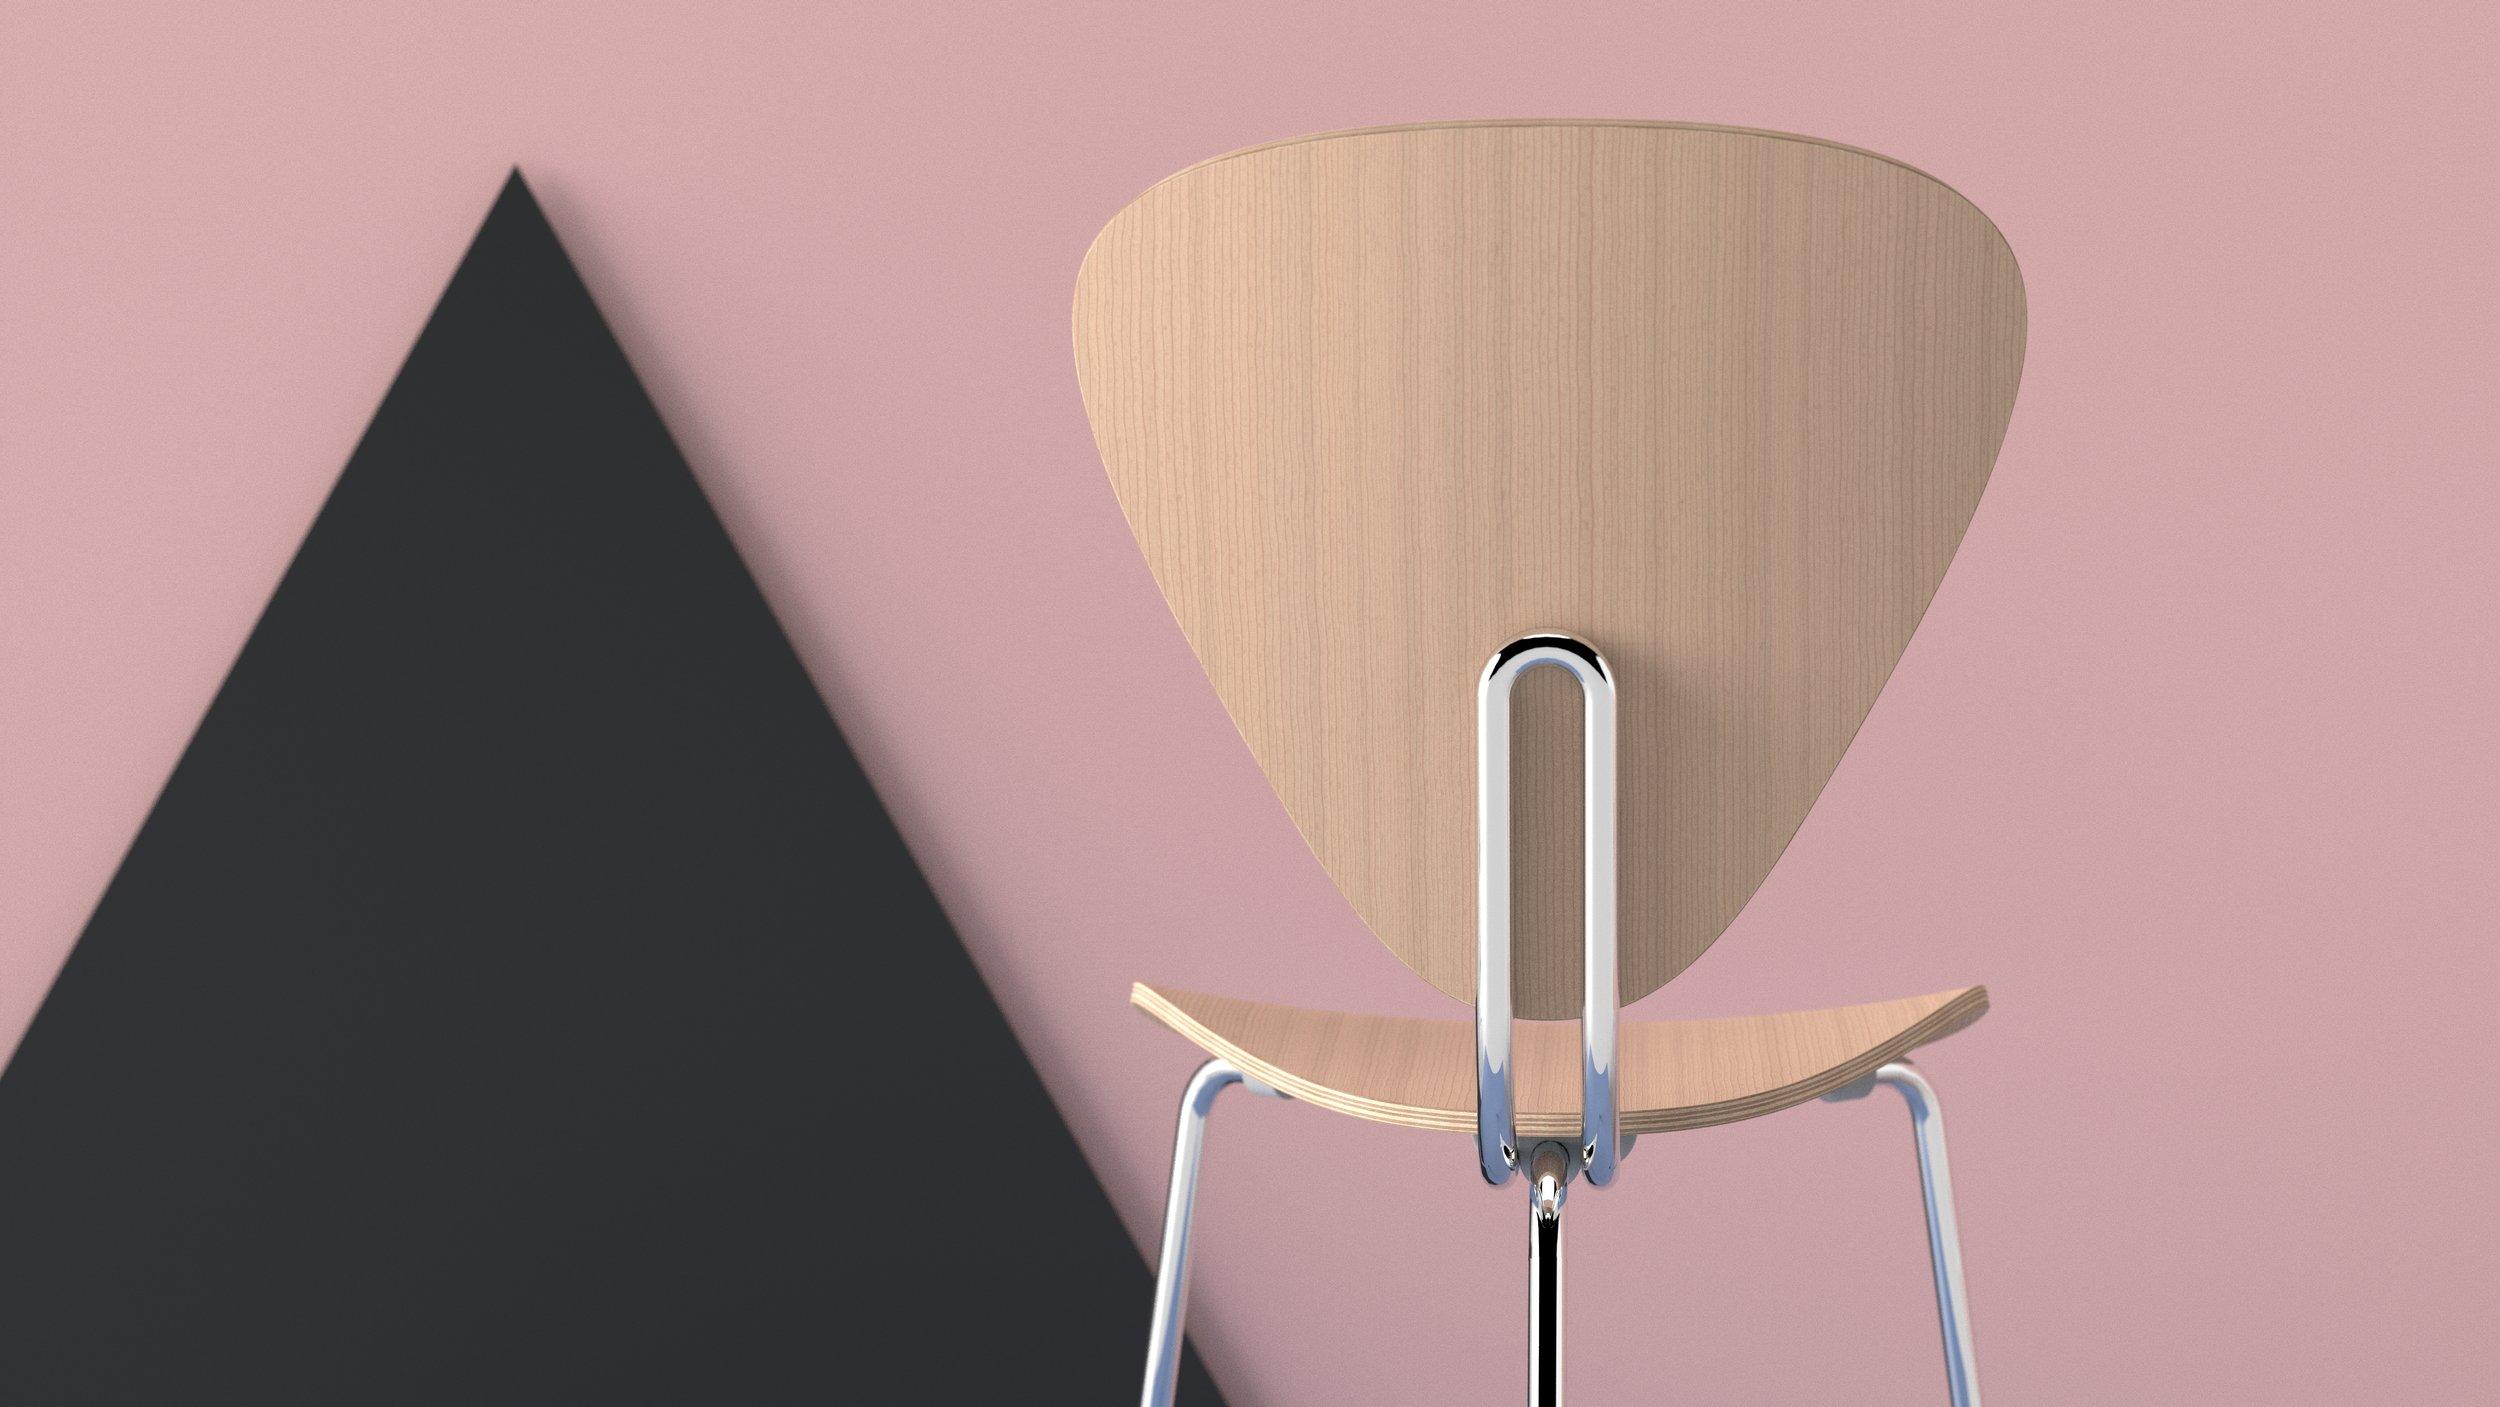 chair concha fondo dos.90fi.98.jpg